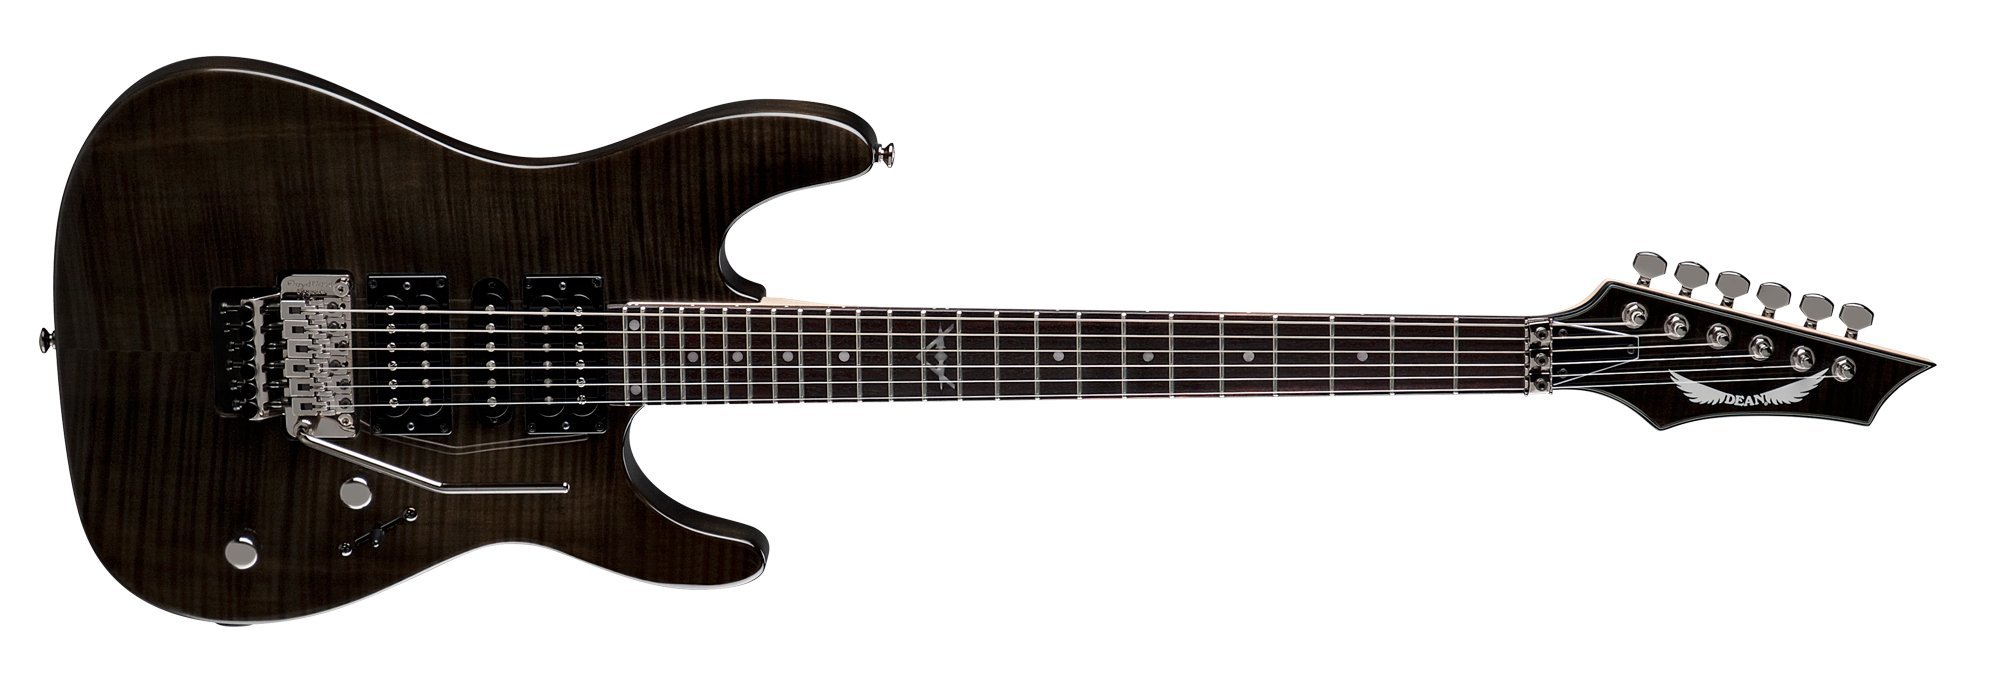 Cheap Dean C380F TBK Electric Guitar Black Friday & Cyber Monday 2019